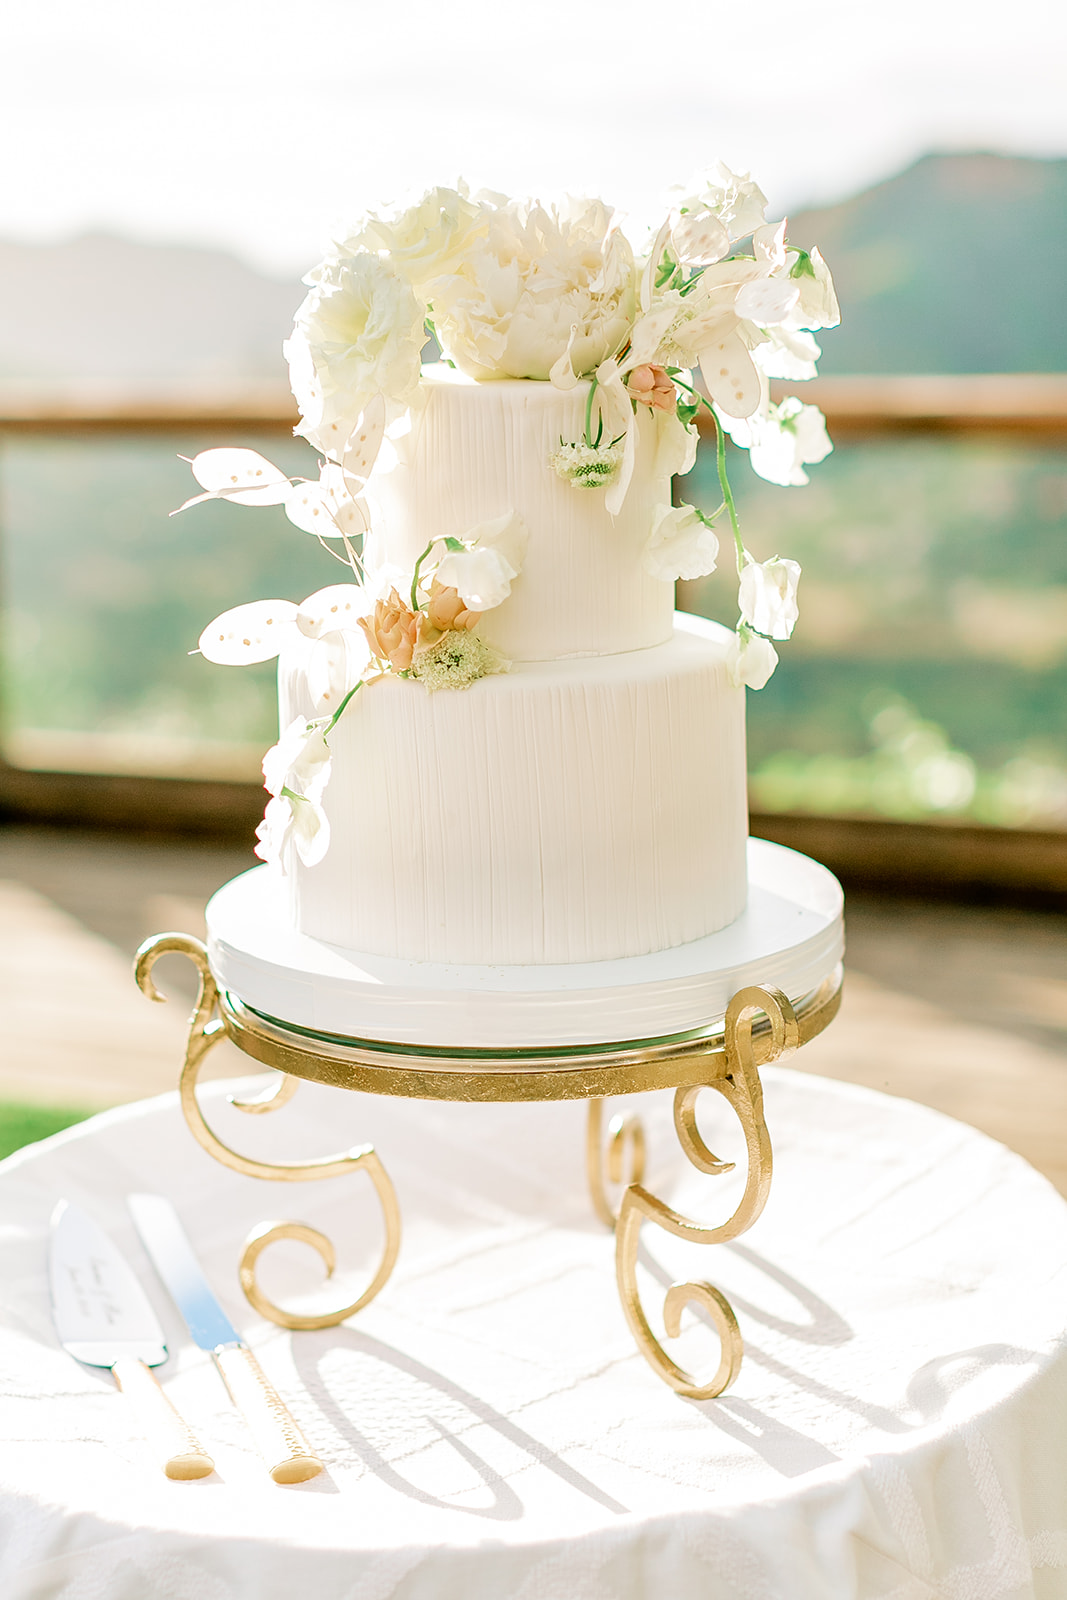 Wedding Cake - Natalie Schutt Photography.jpg